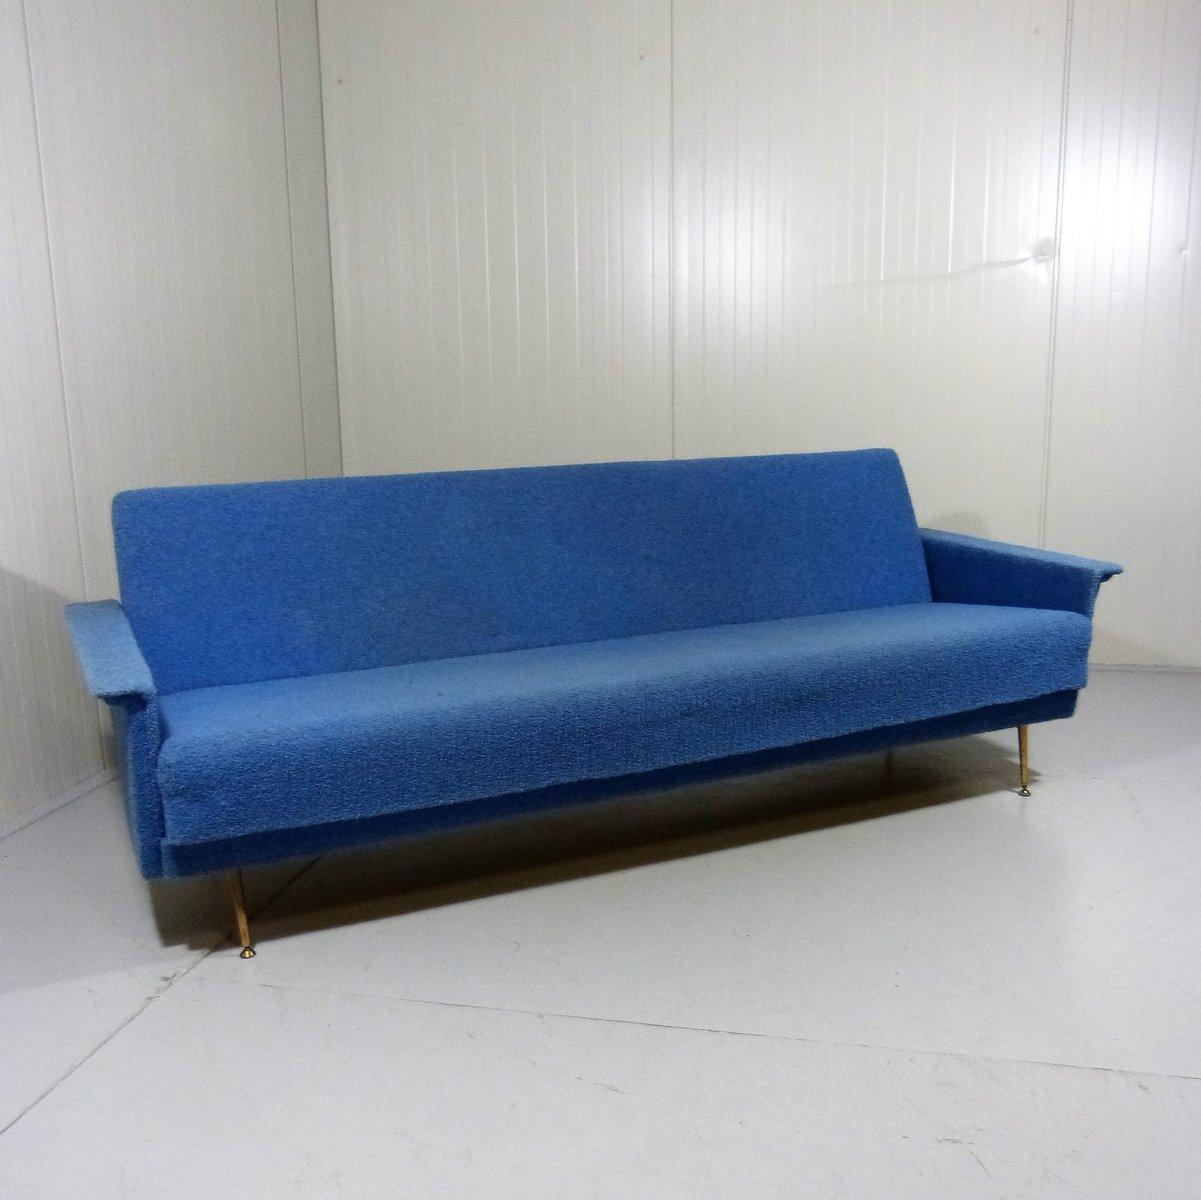 blaues schlafsofa 1950er bei pamono kaufen. Black Bedroom Furniture Sets. Home Design Ideas